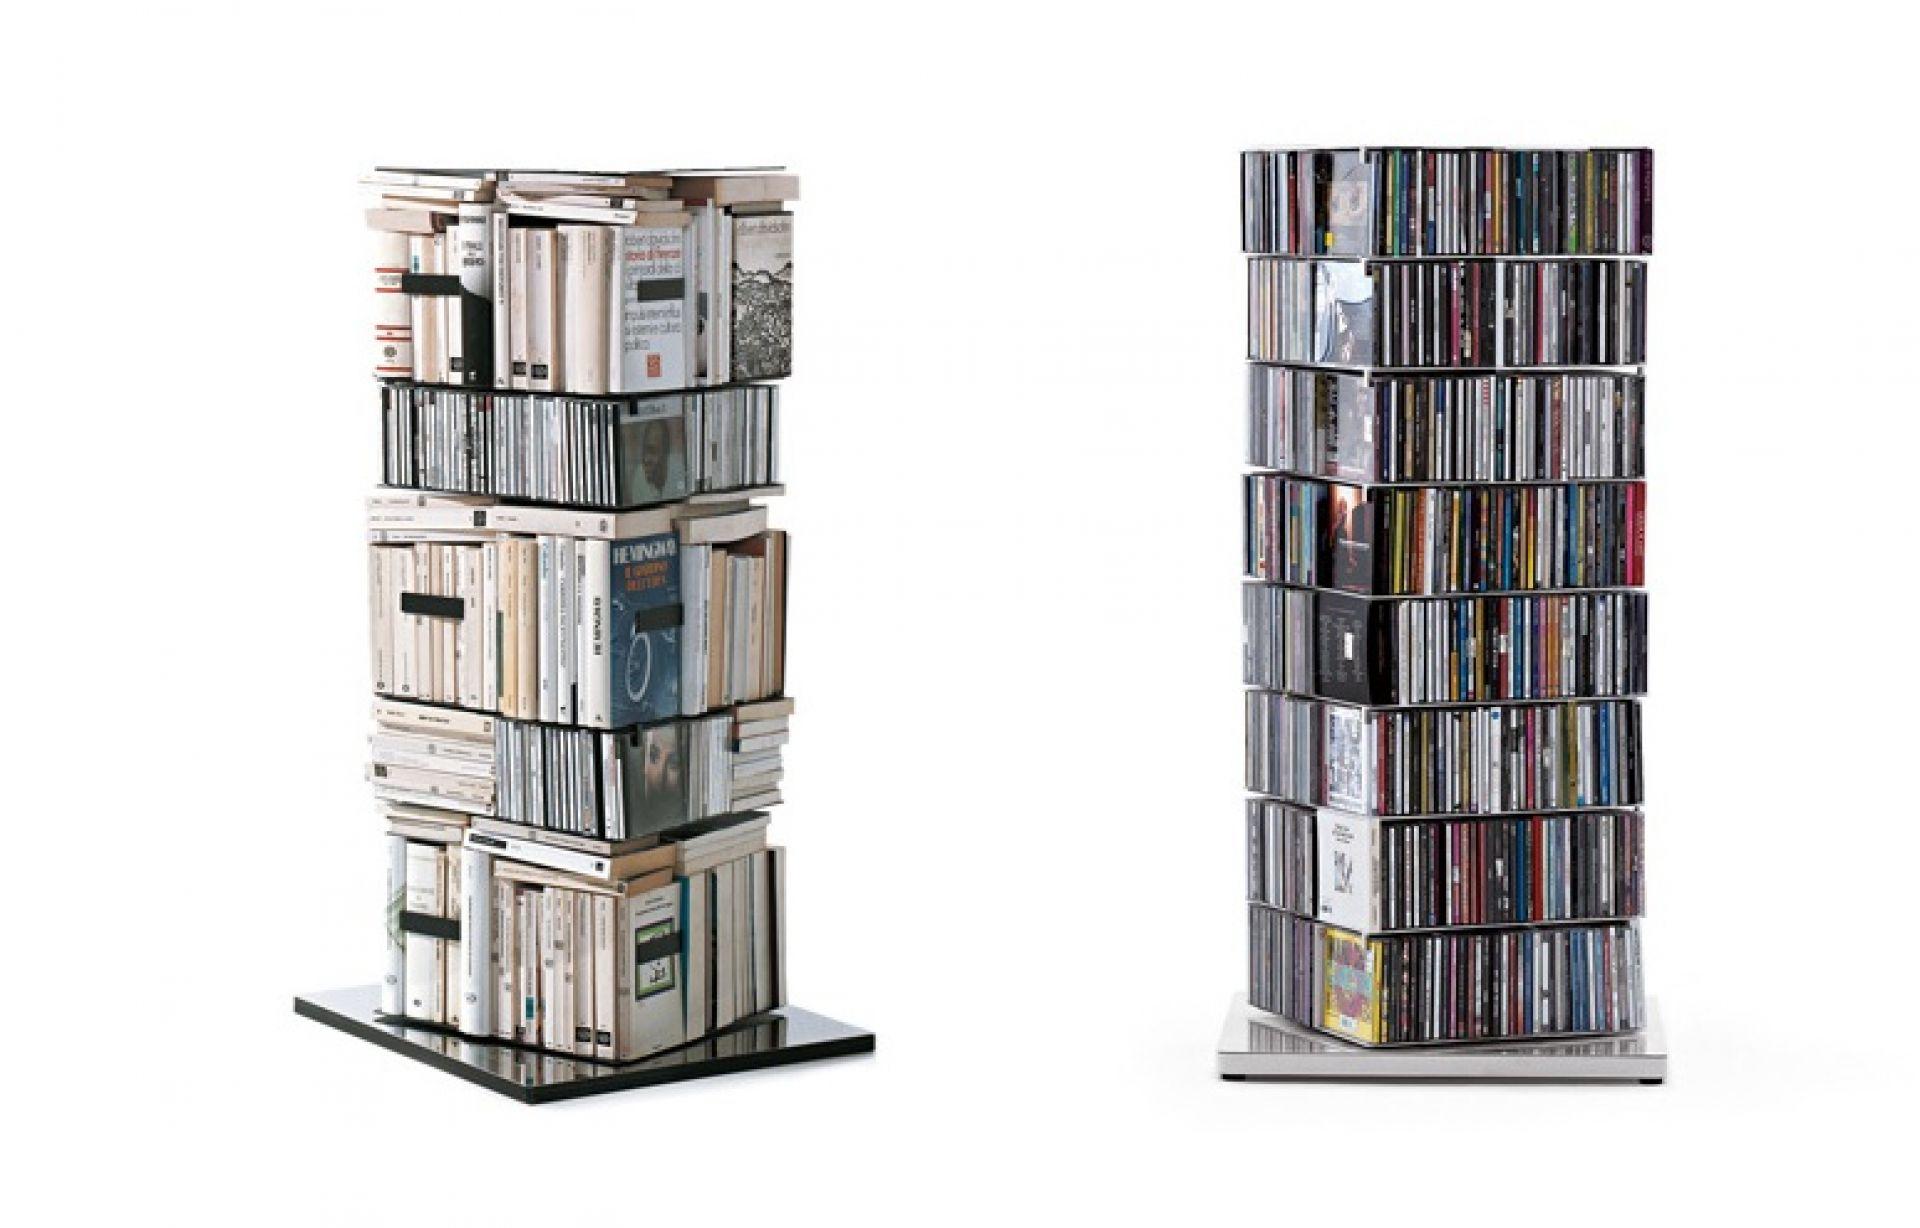 Ptolomeo drehbare Bücher / CD Säule PTX4110WW-A Hx110 cm Opinion Ciatti